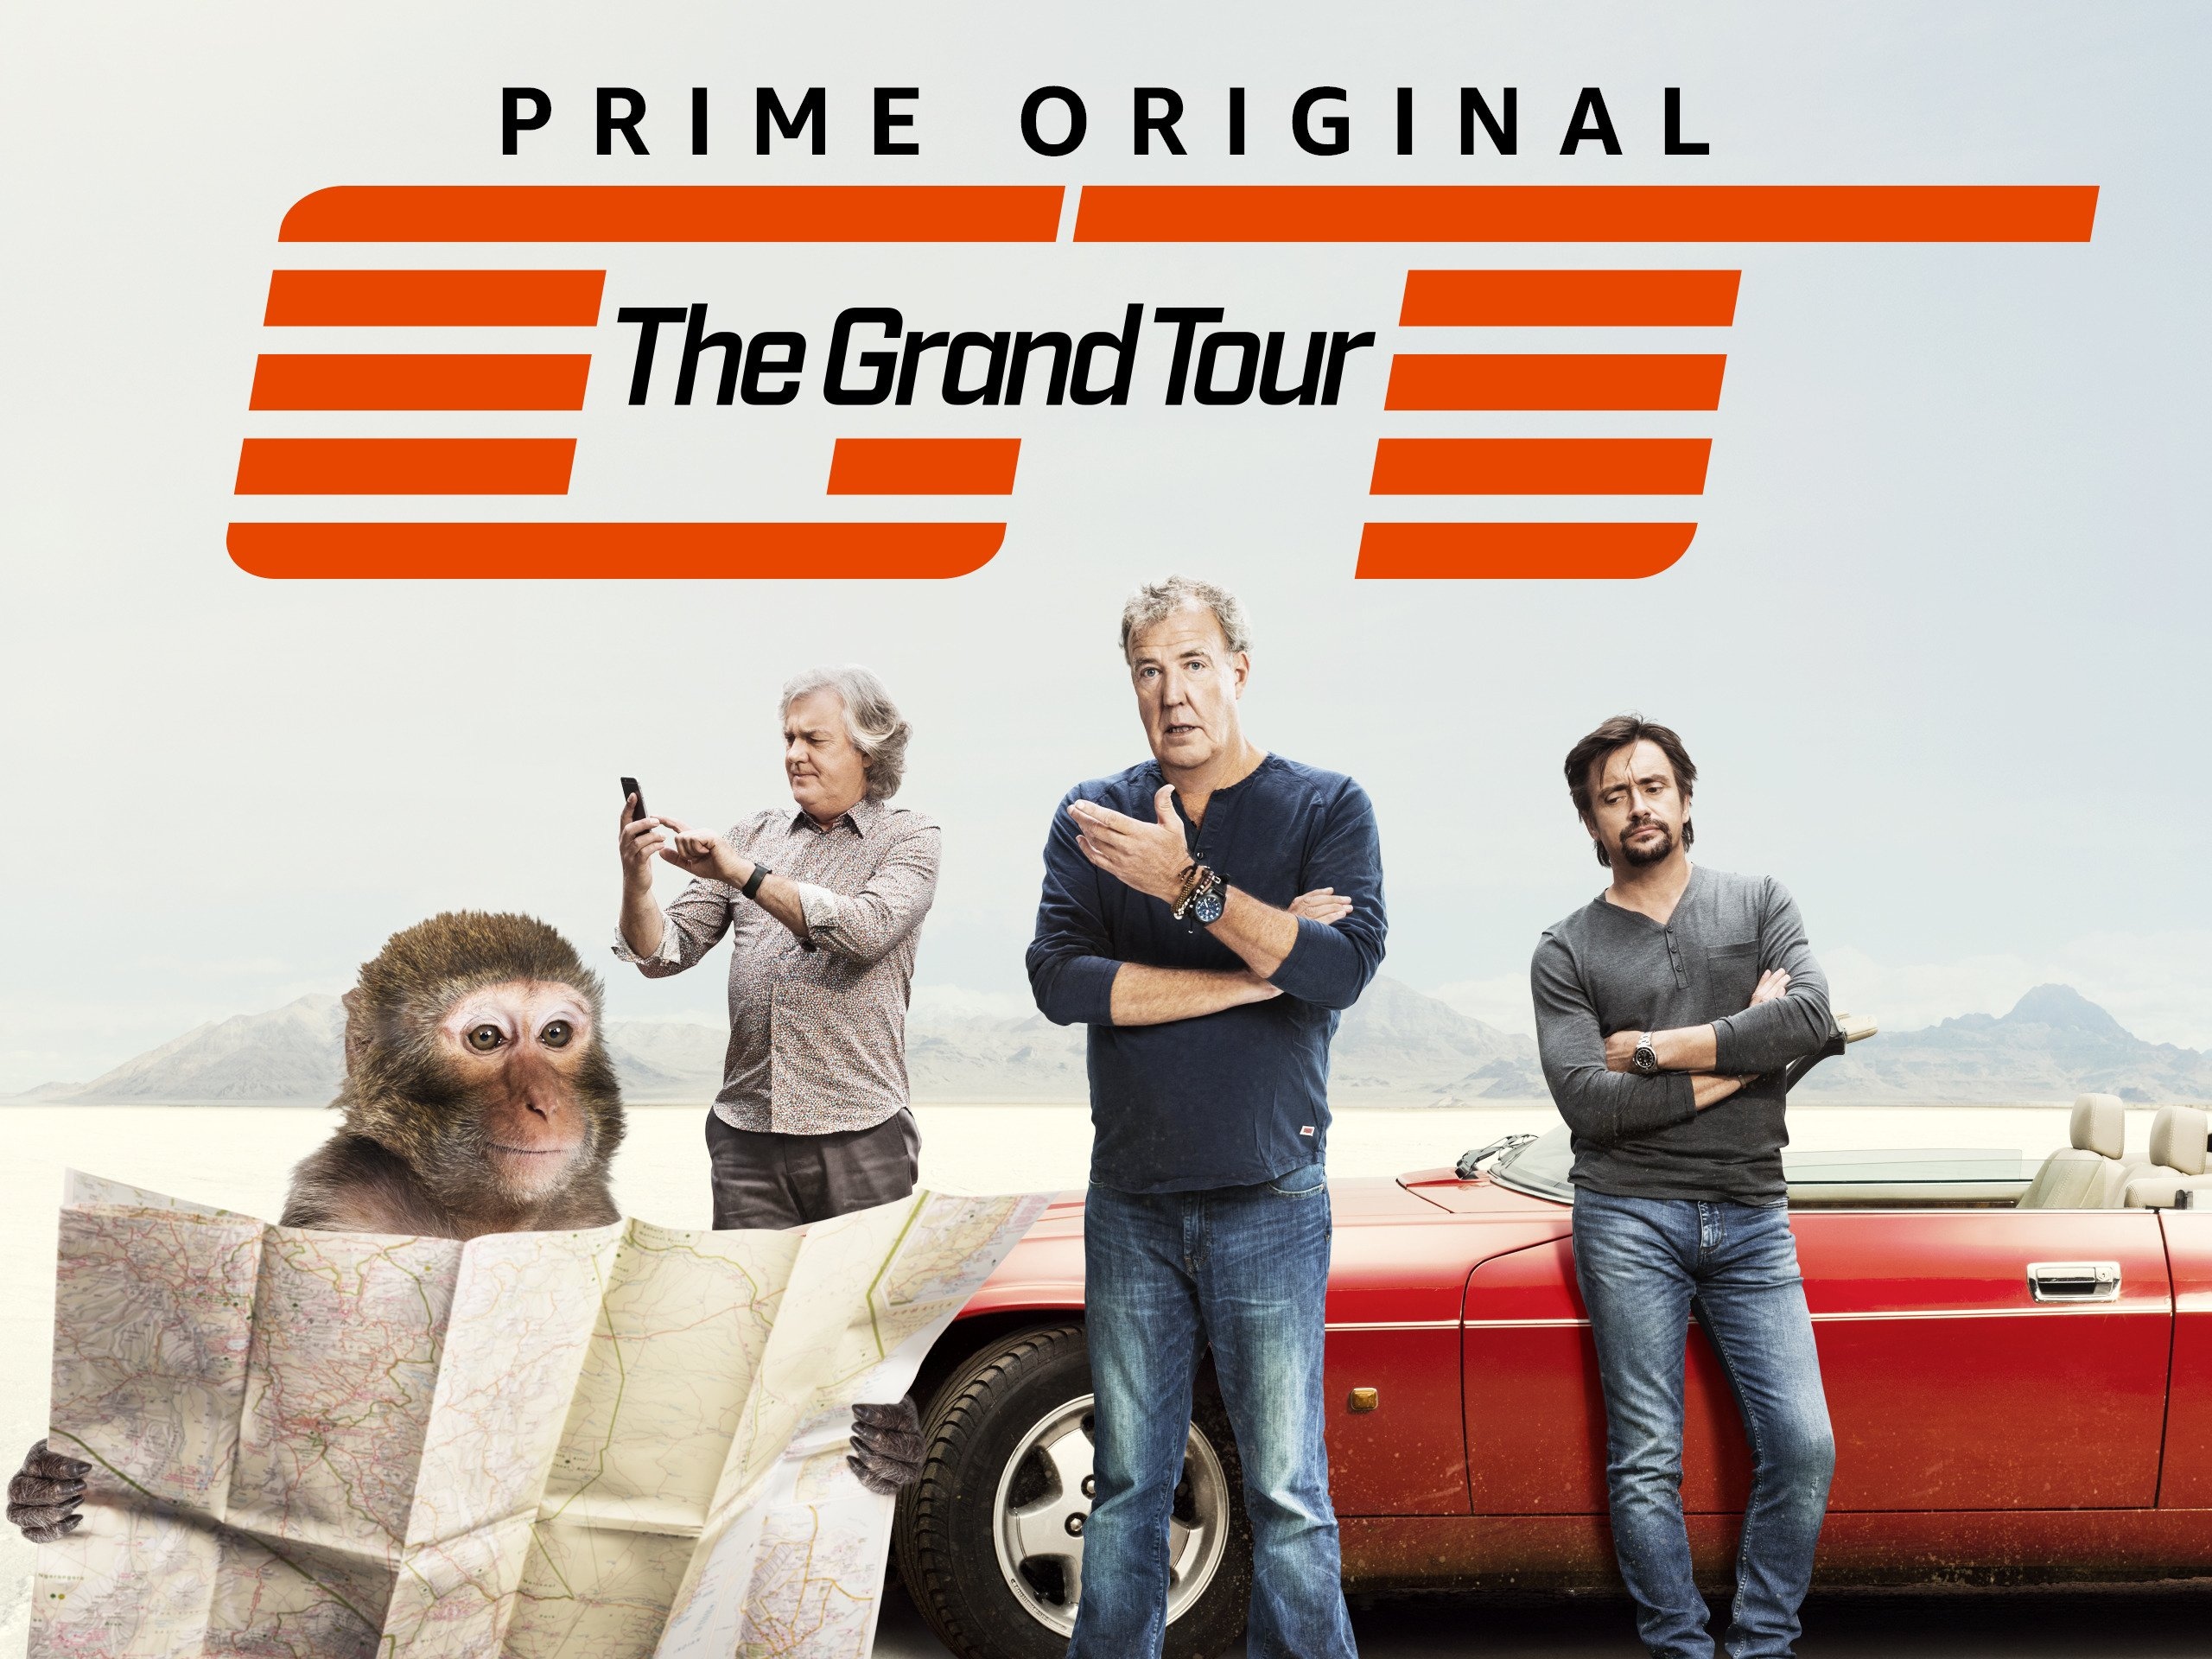 Amazon.com: The Grand Tour Season 2: Jeremy Clarkson, Richard Hammond,  James May, Mike Skinner, Abbie Eaton, Golden Earring, Simon Pegg, David  Hasselhoff, ...